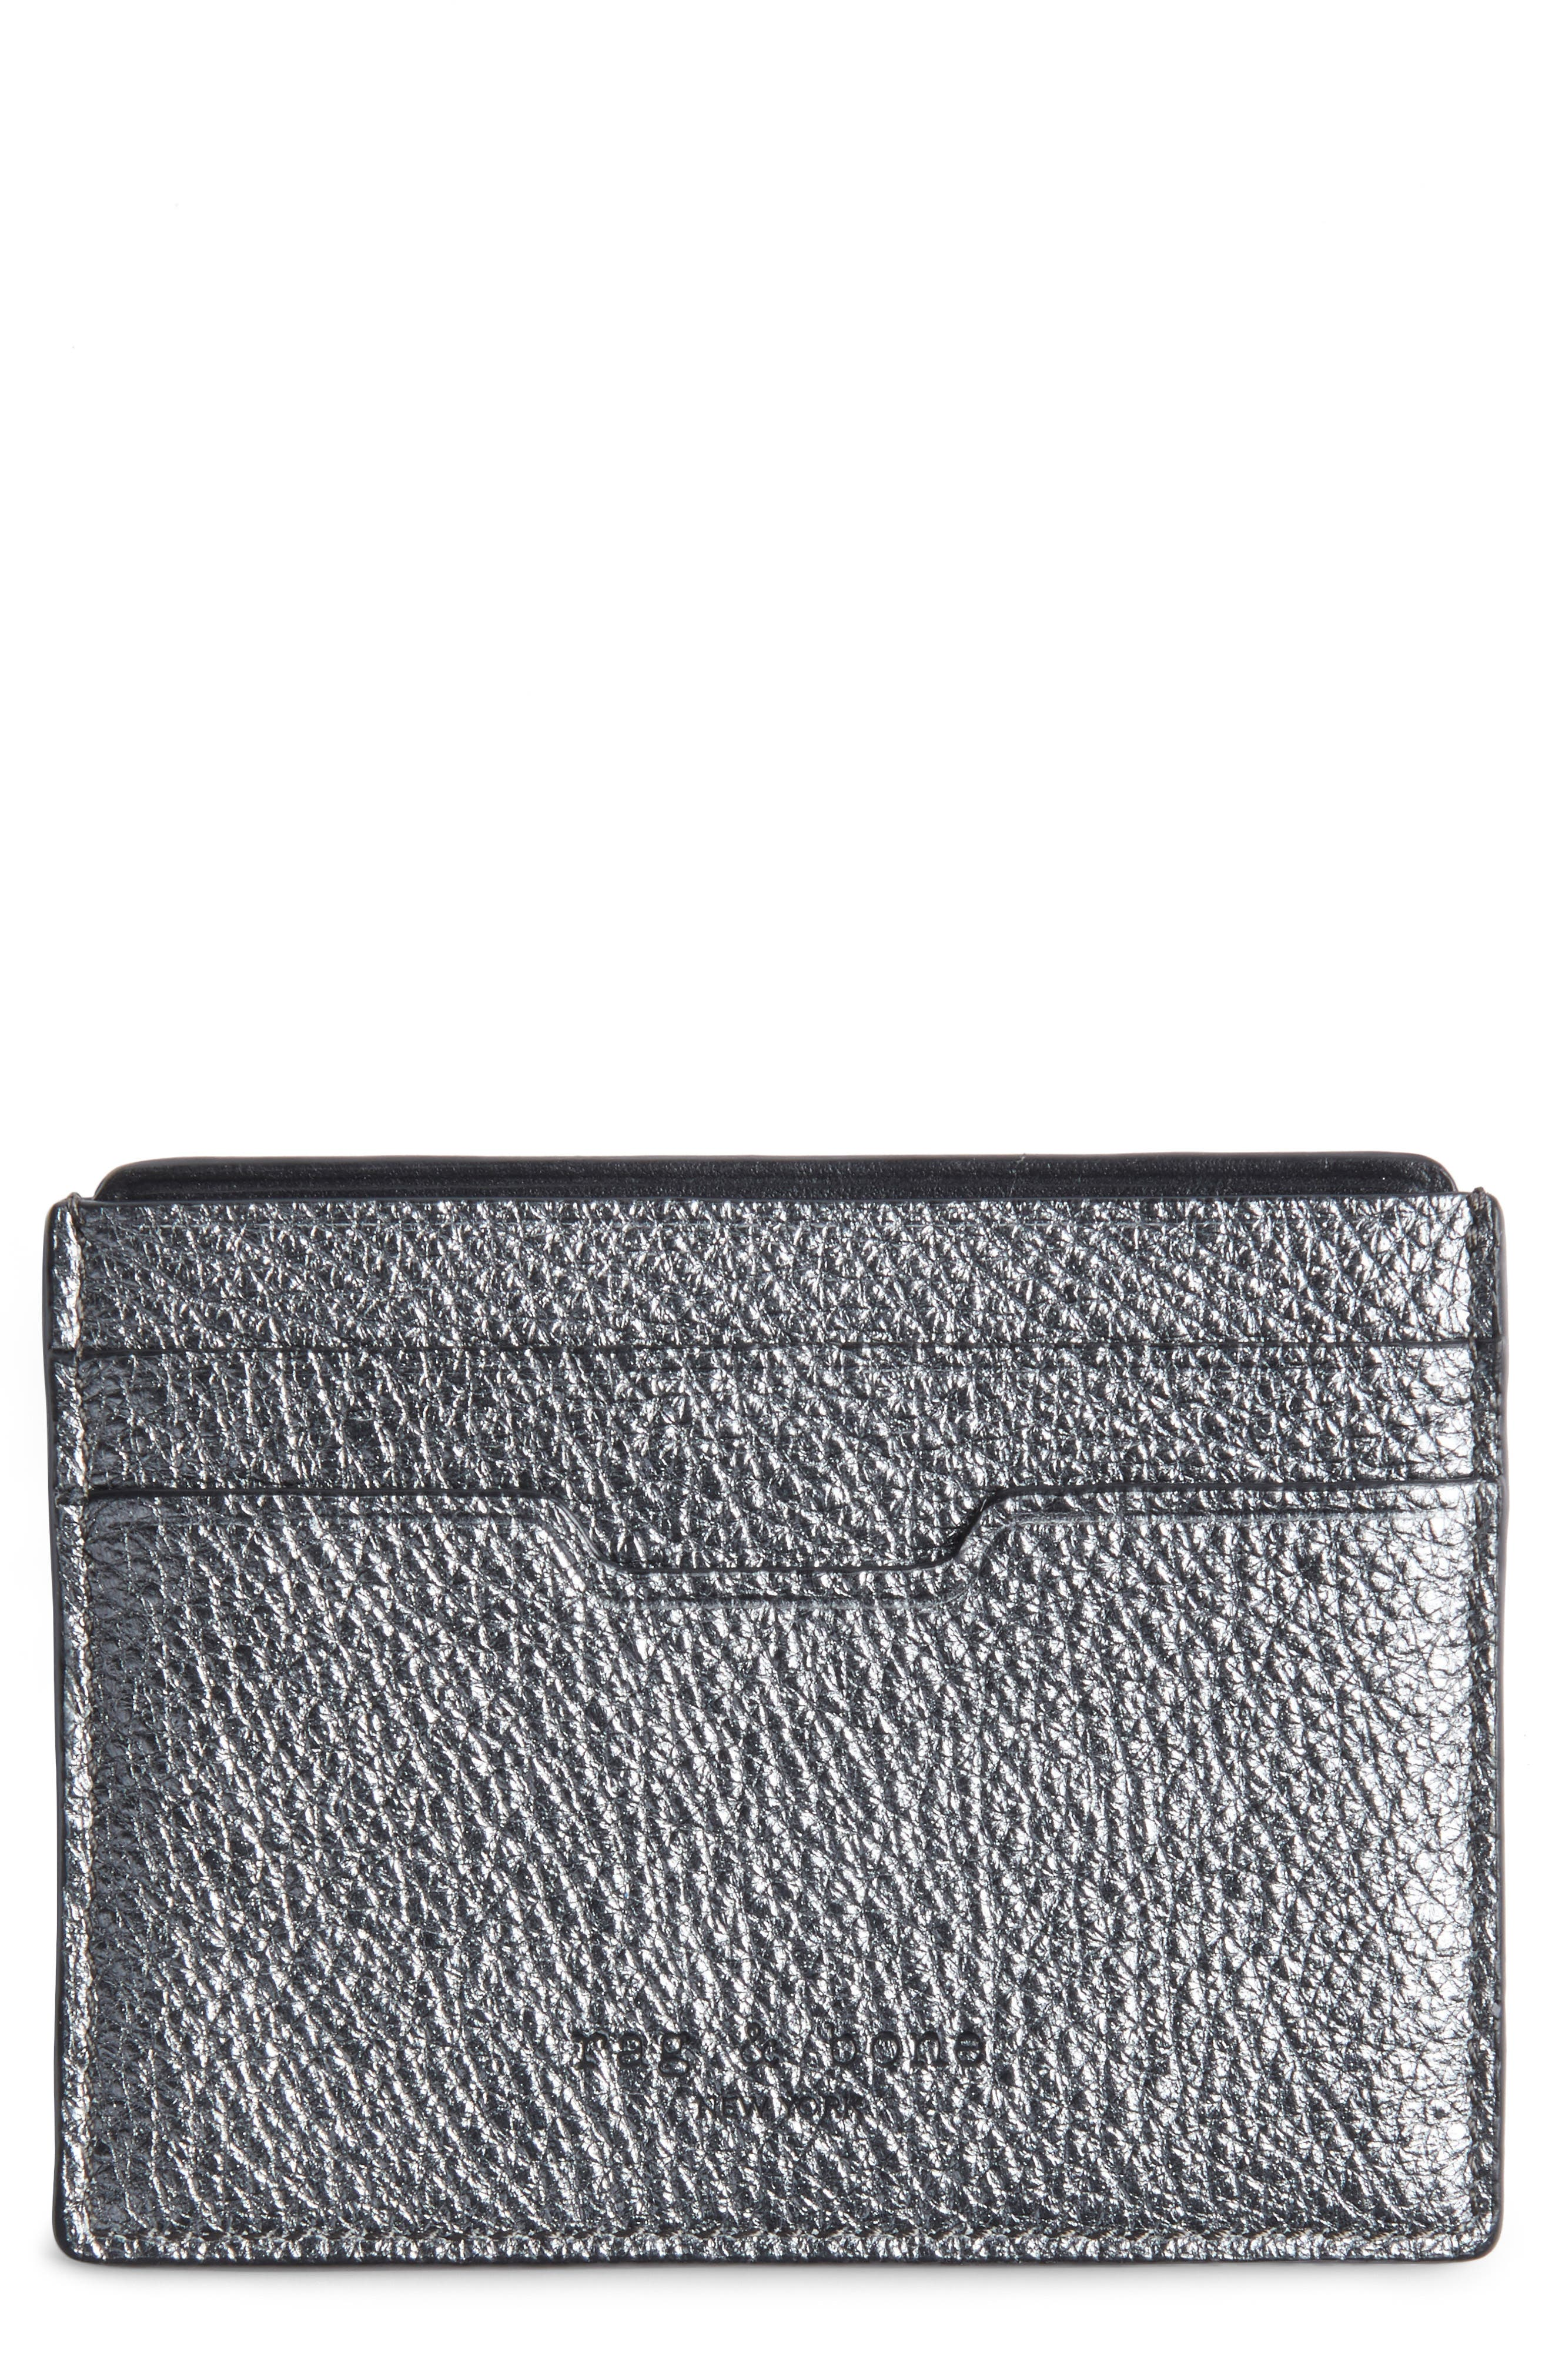 rag & bone Textured Buffalo Leather Card Case